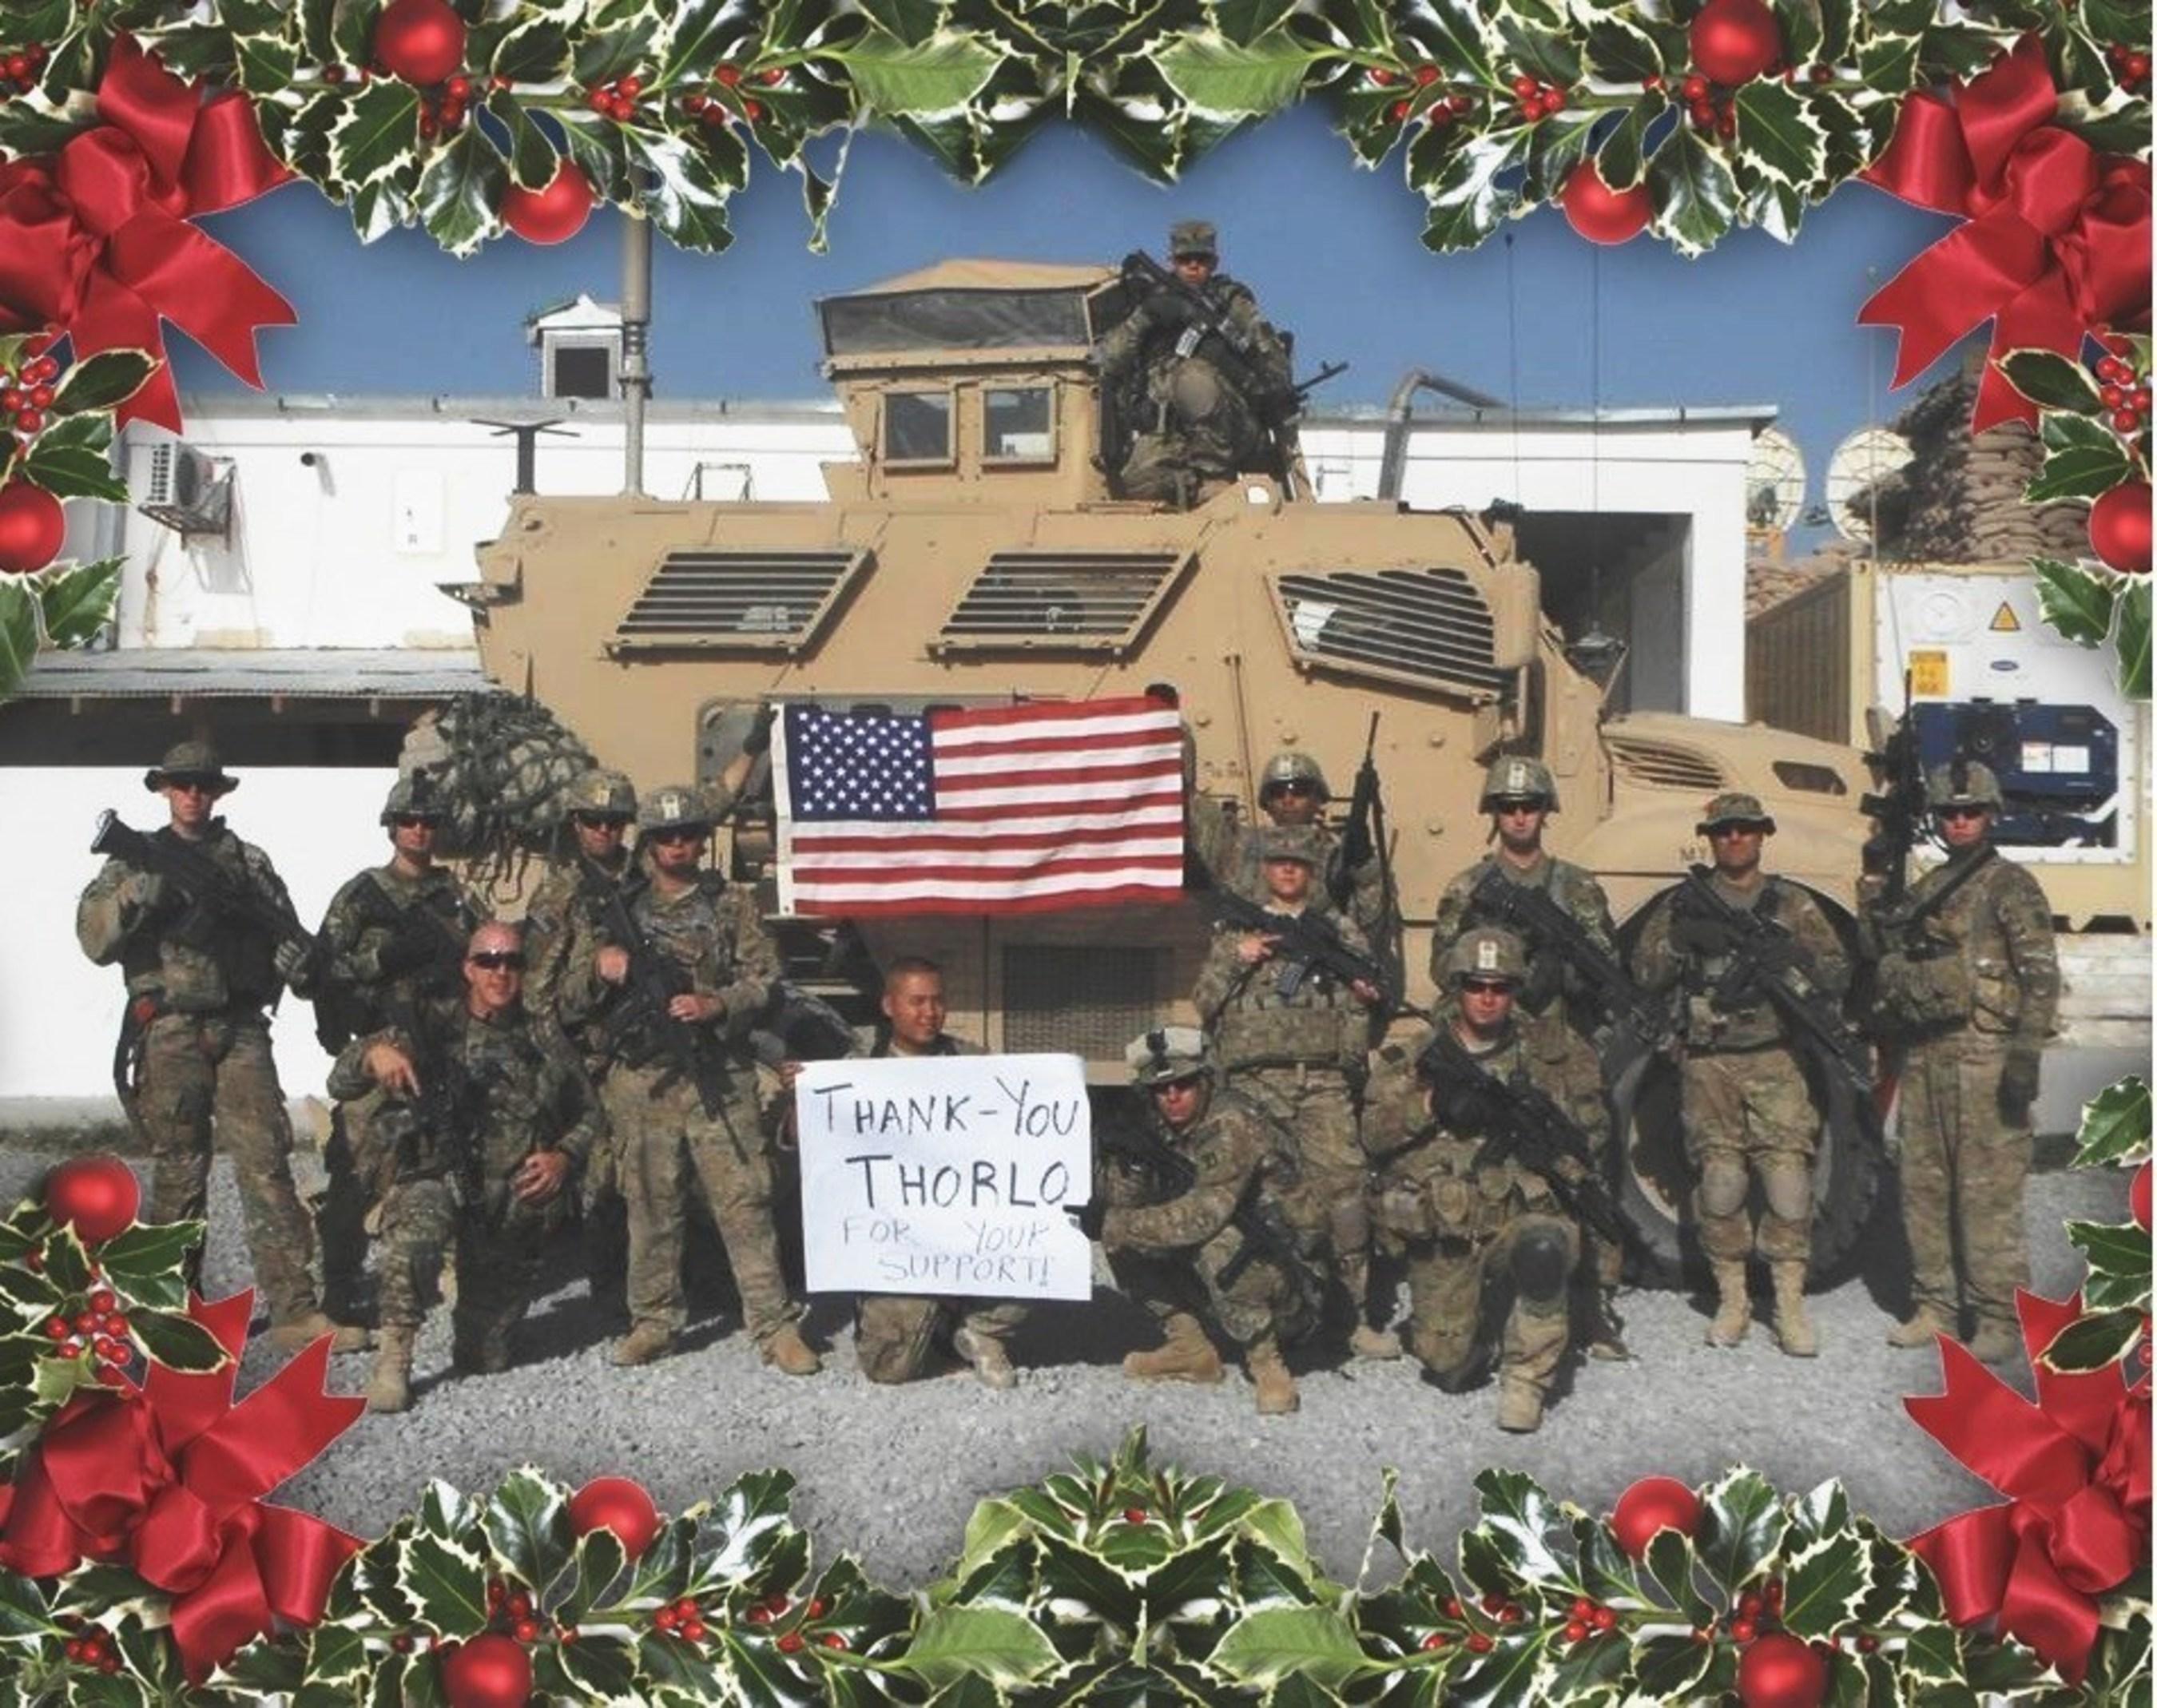 Troops Thank Thorlos